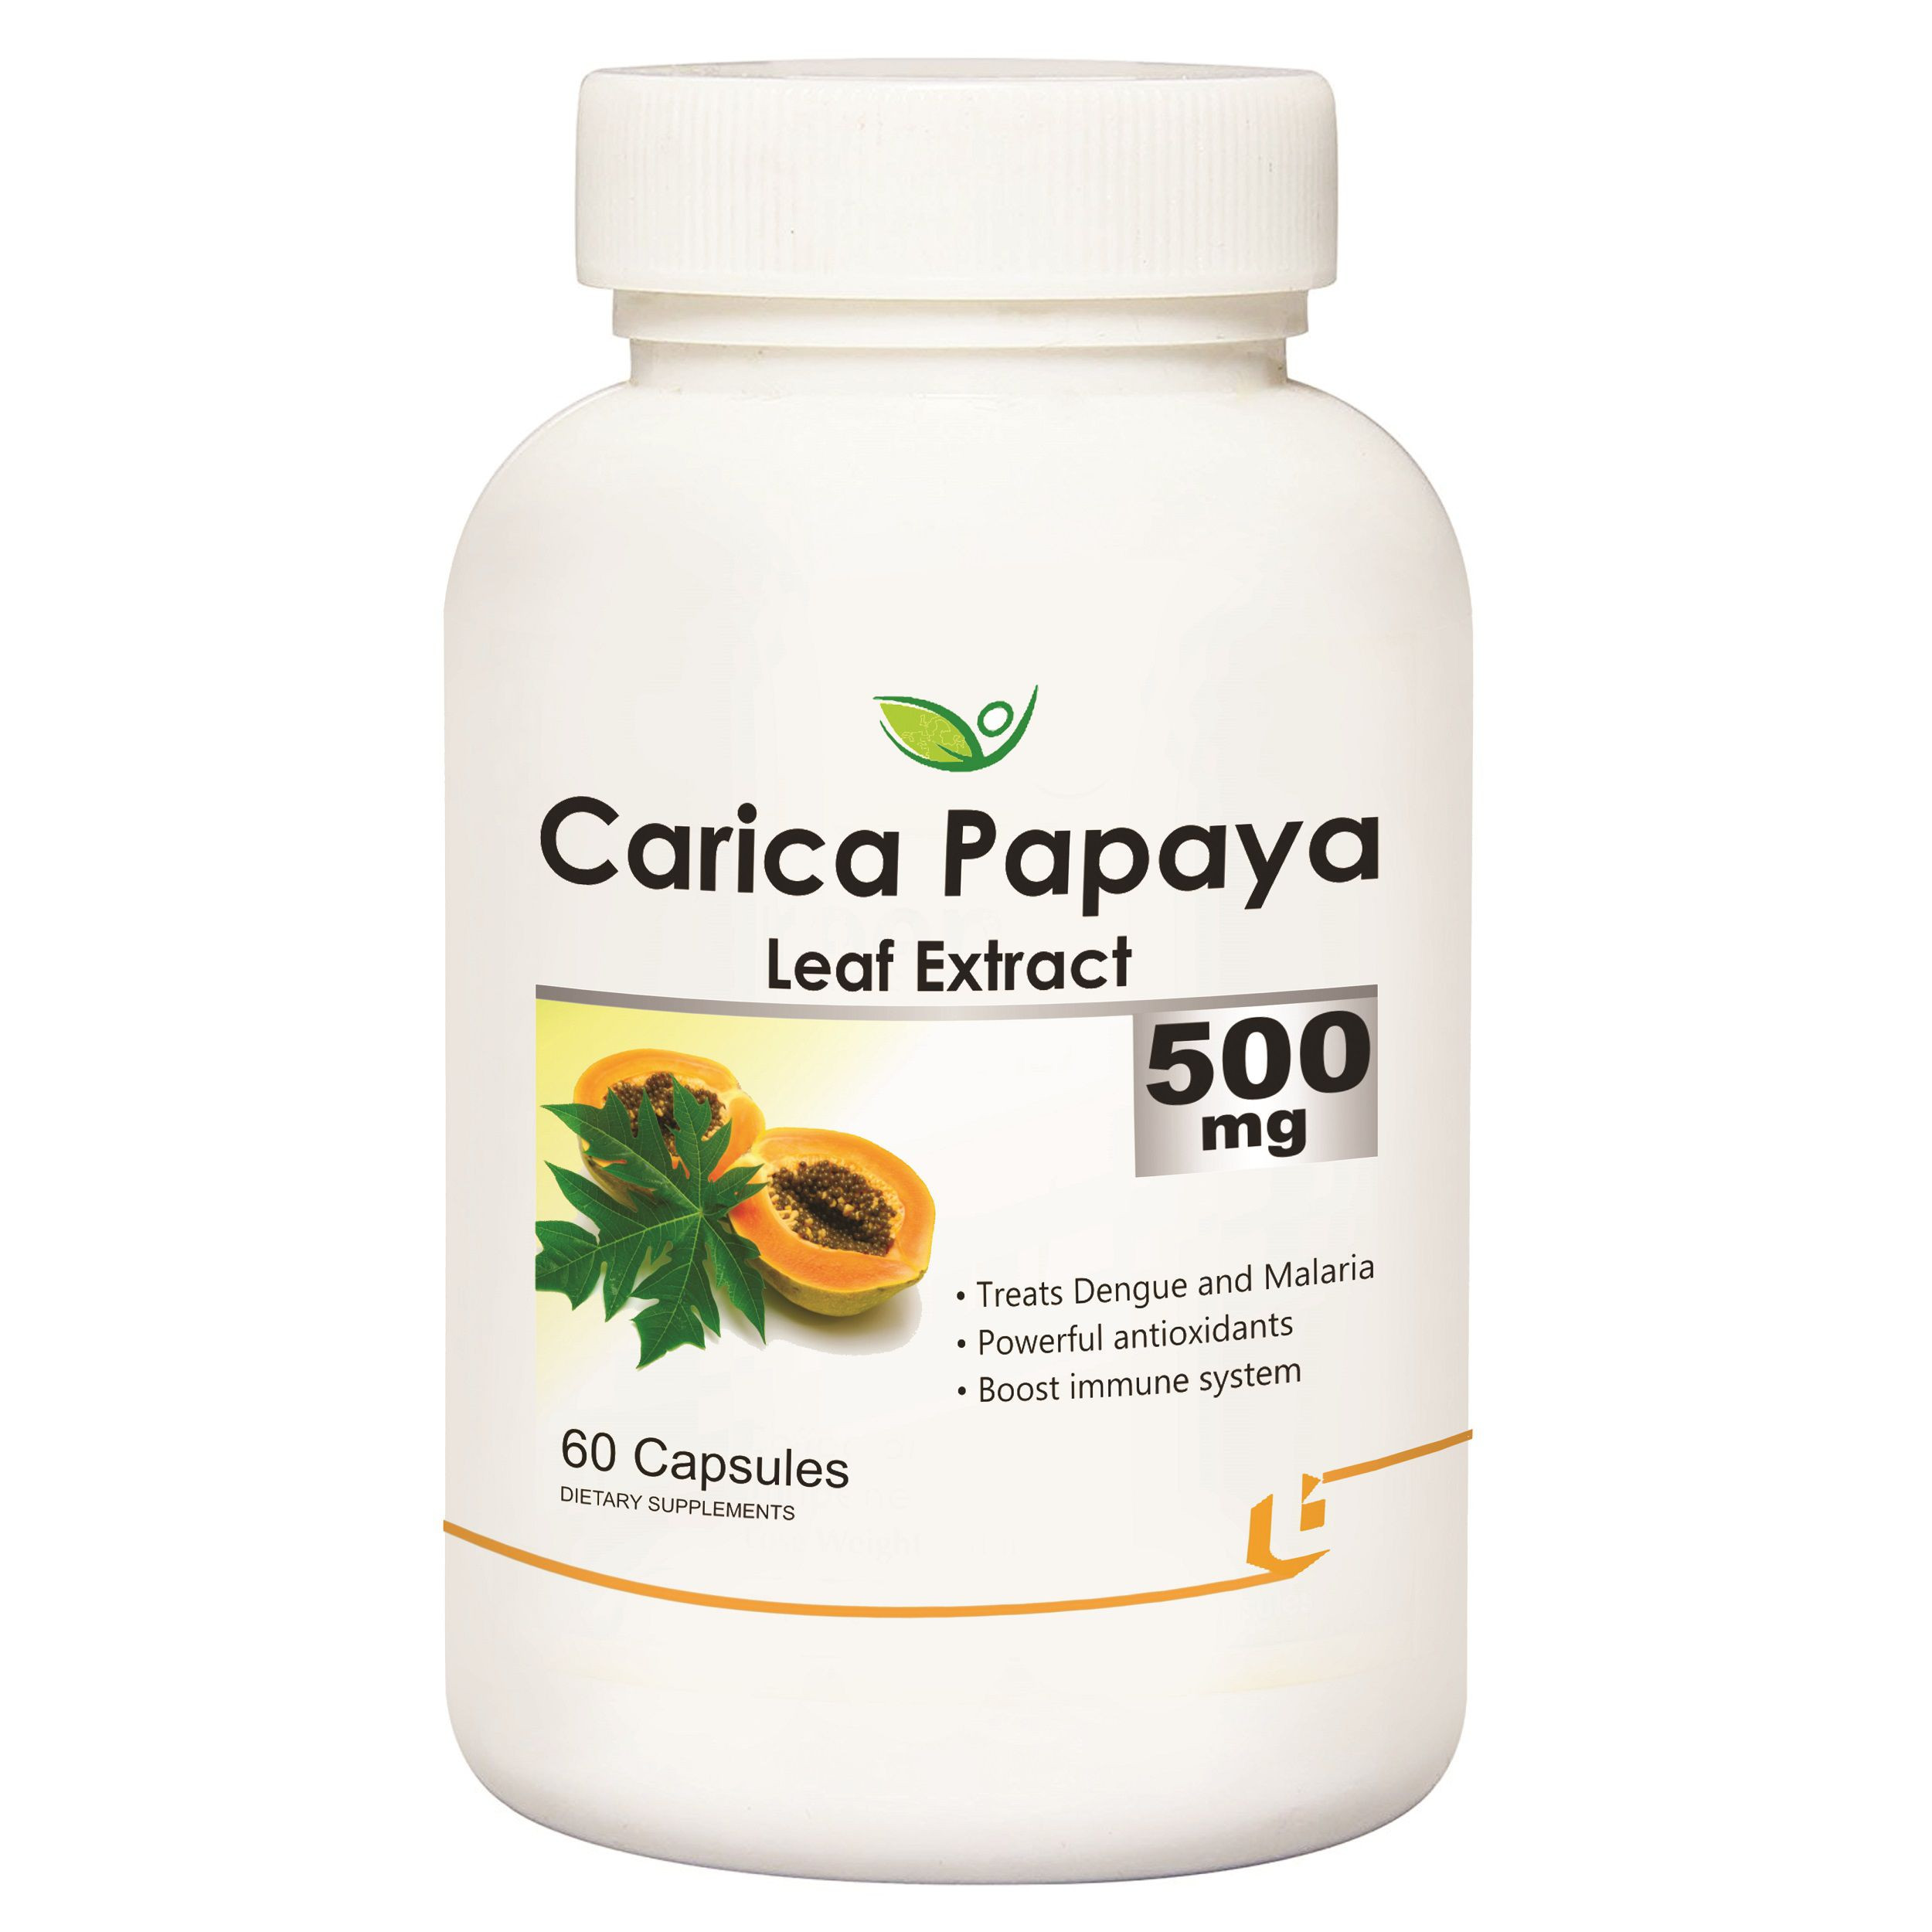 Biotrex Carica Papaya Leaf Extract Capsule 500 mg